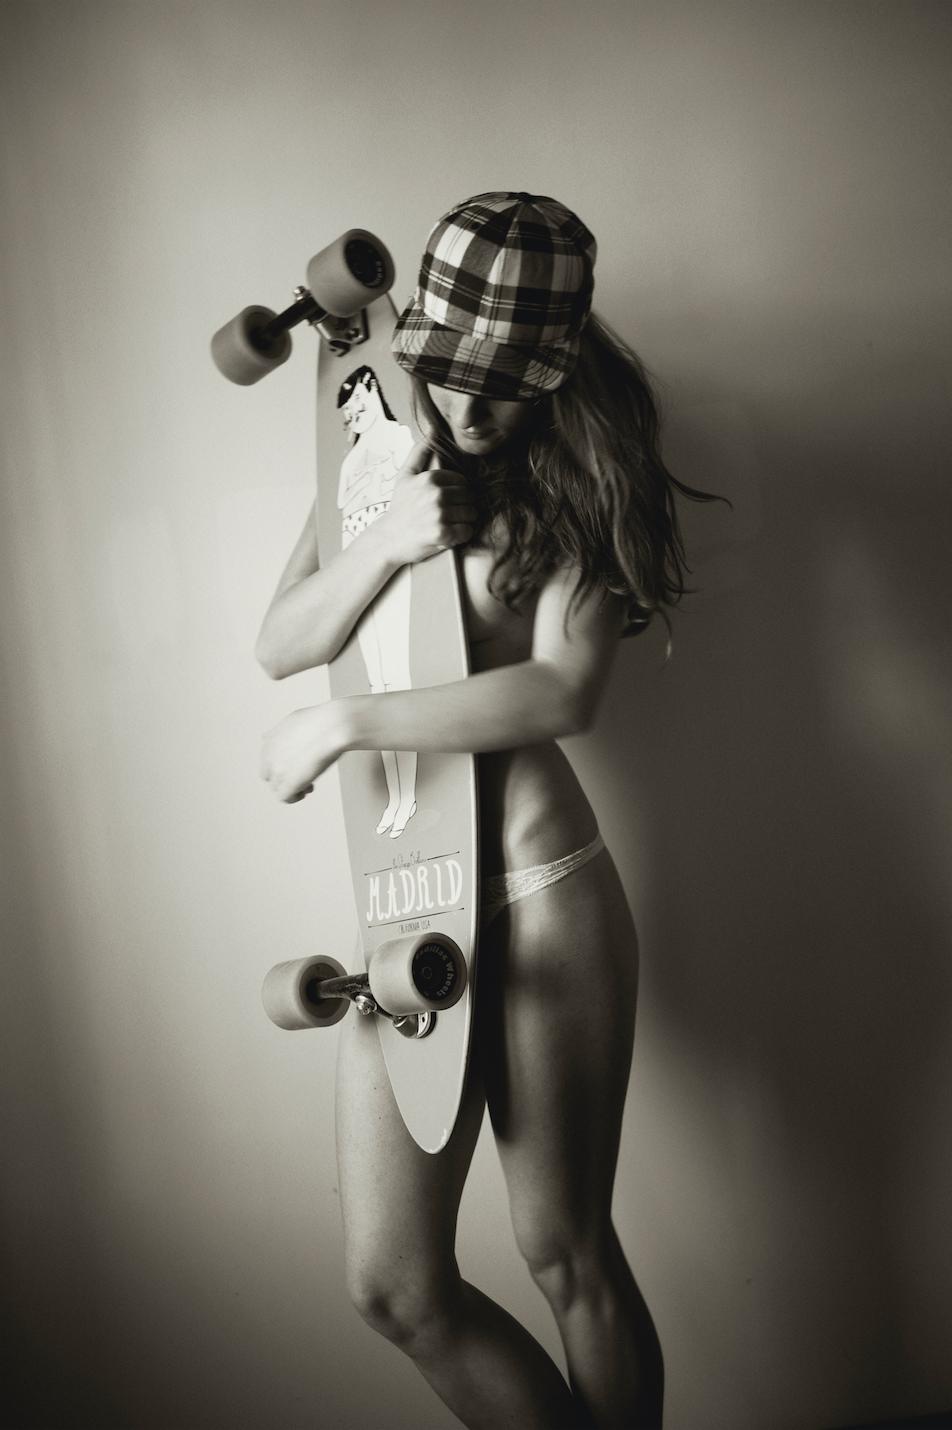 Longboard Girl, 2012 © Sonia Szóstak  courtesy the artist & No Wódka